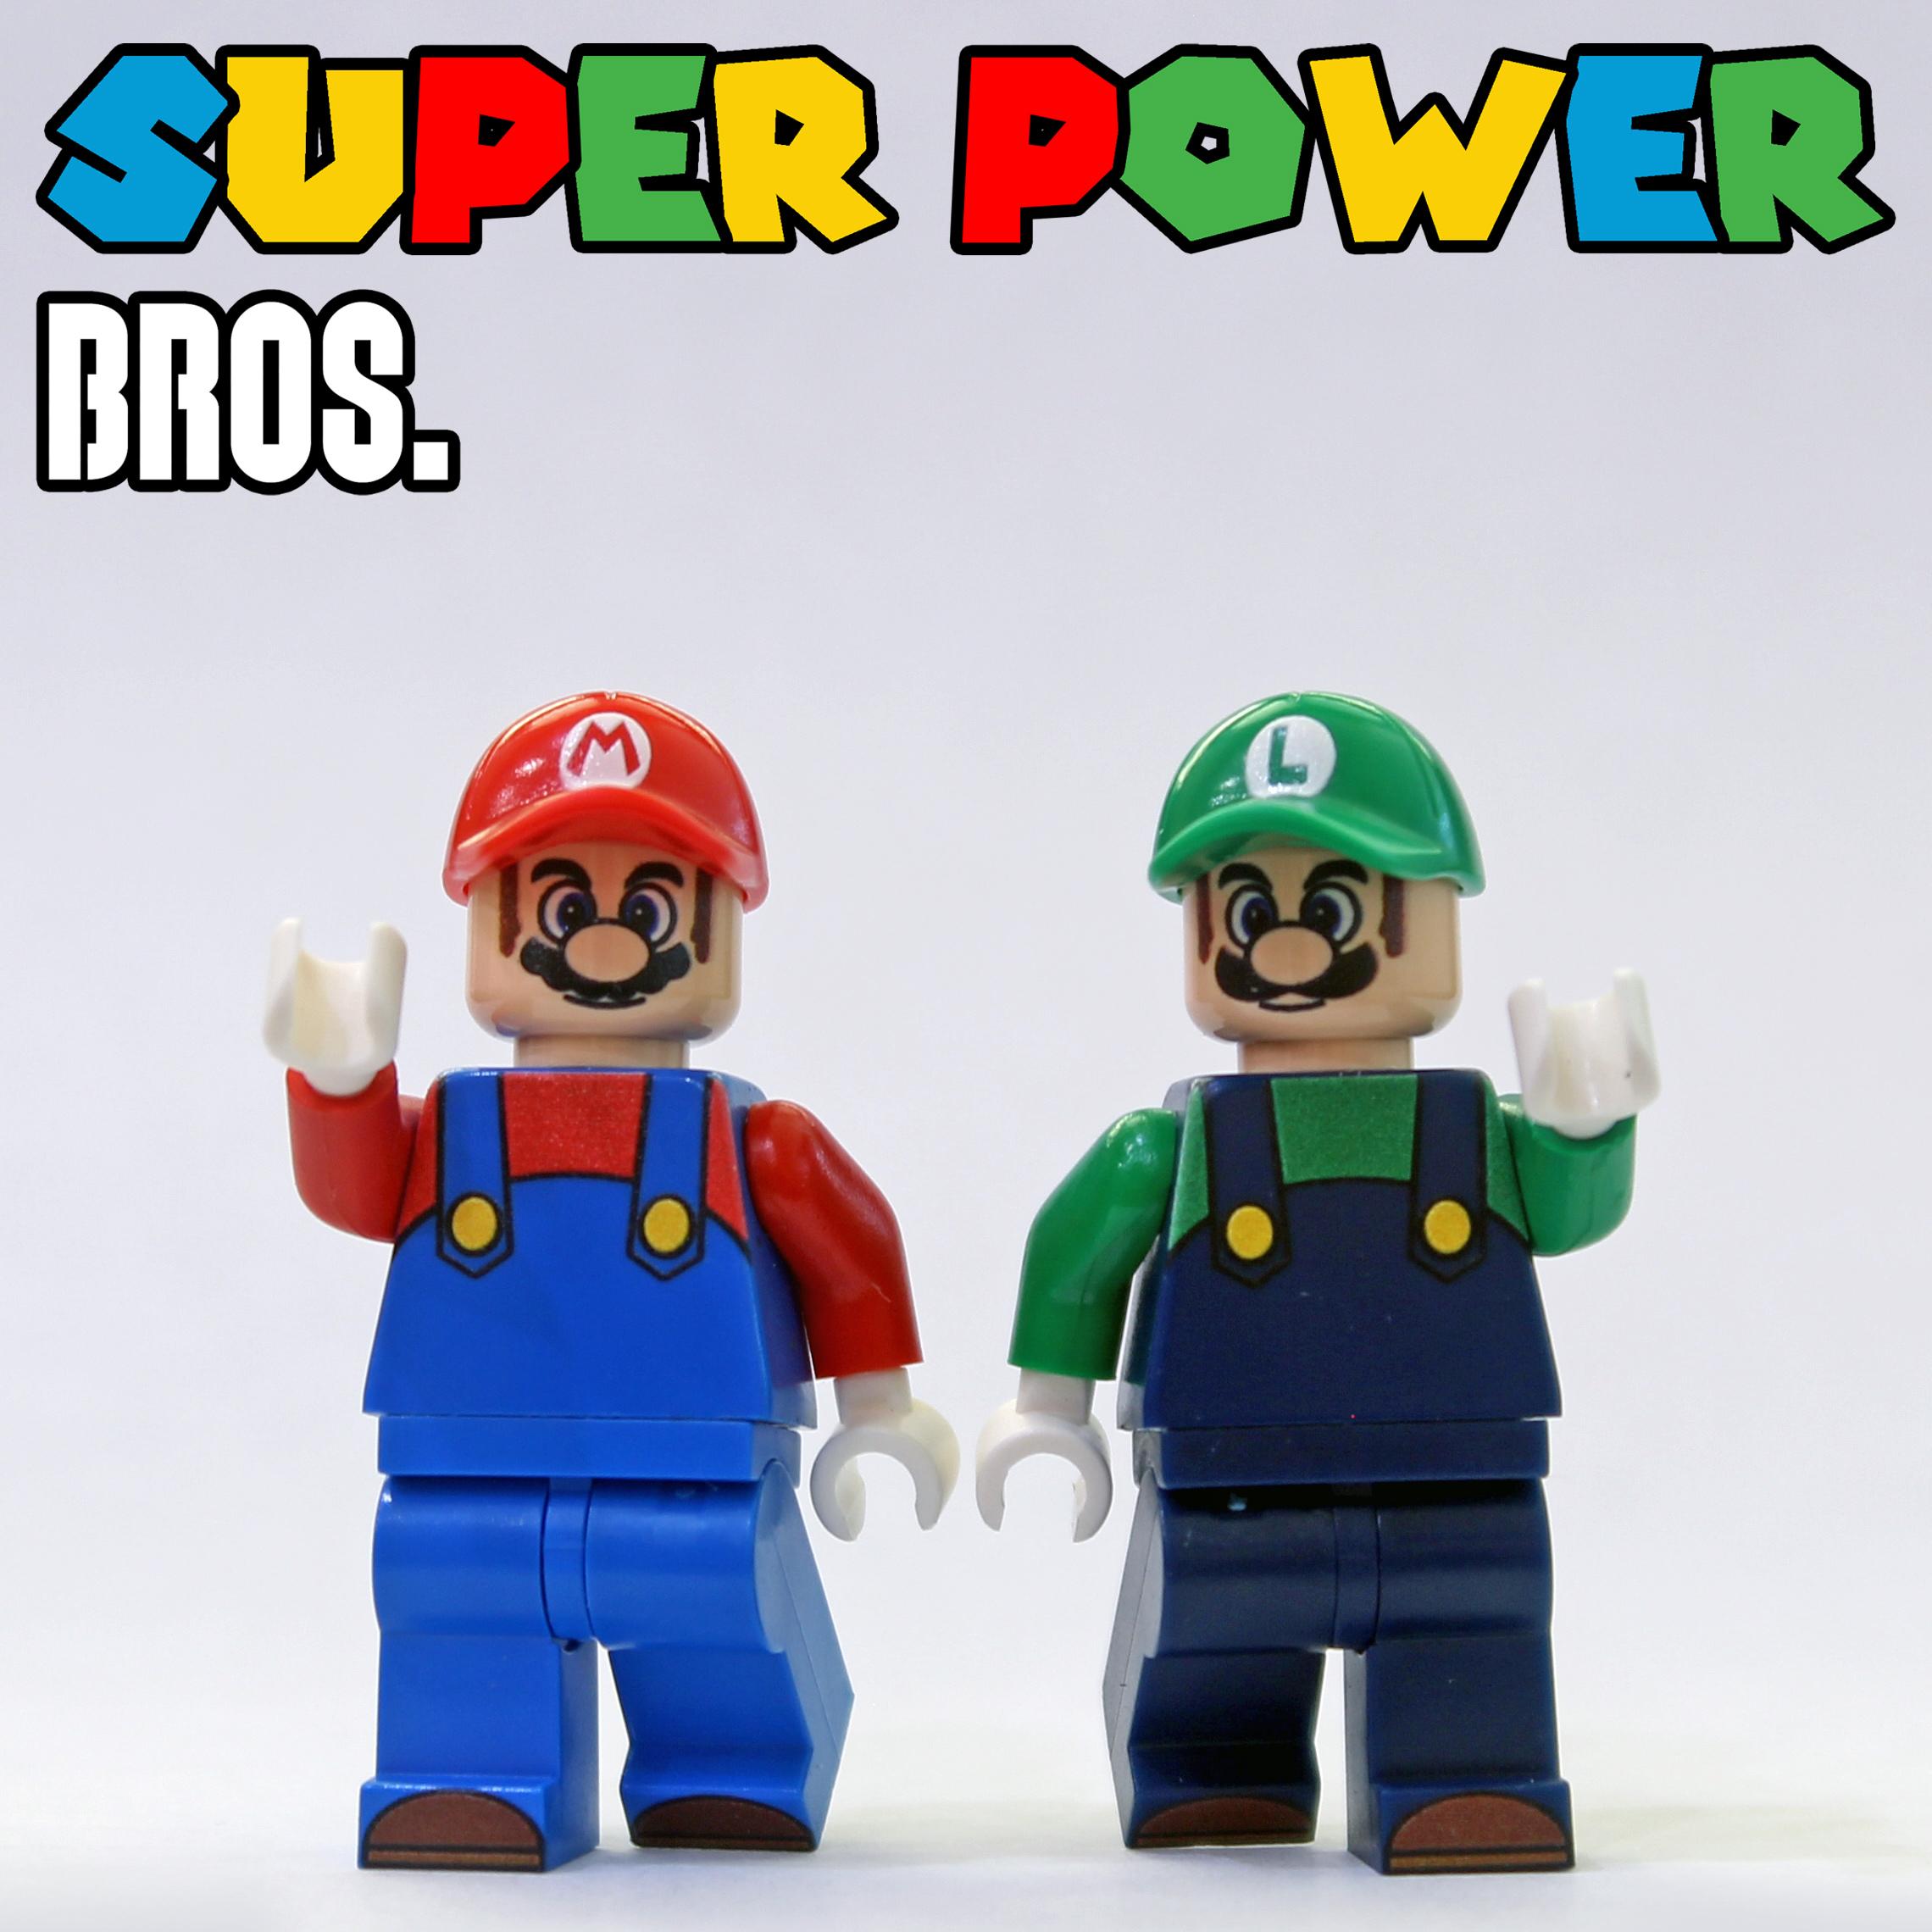 SUPER POWER BROS. BLFIG01